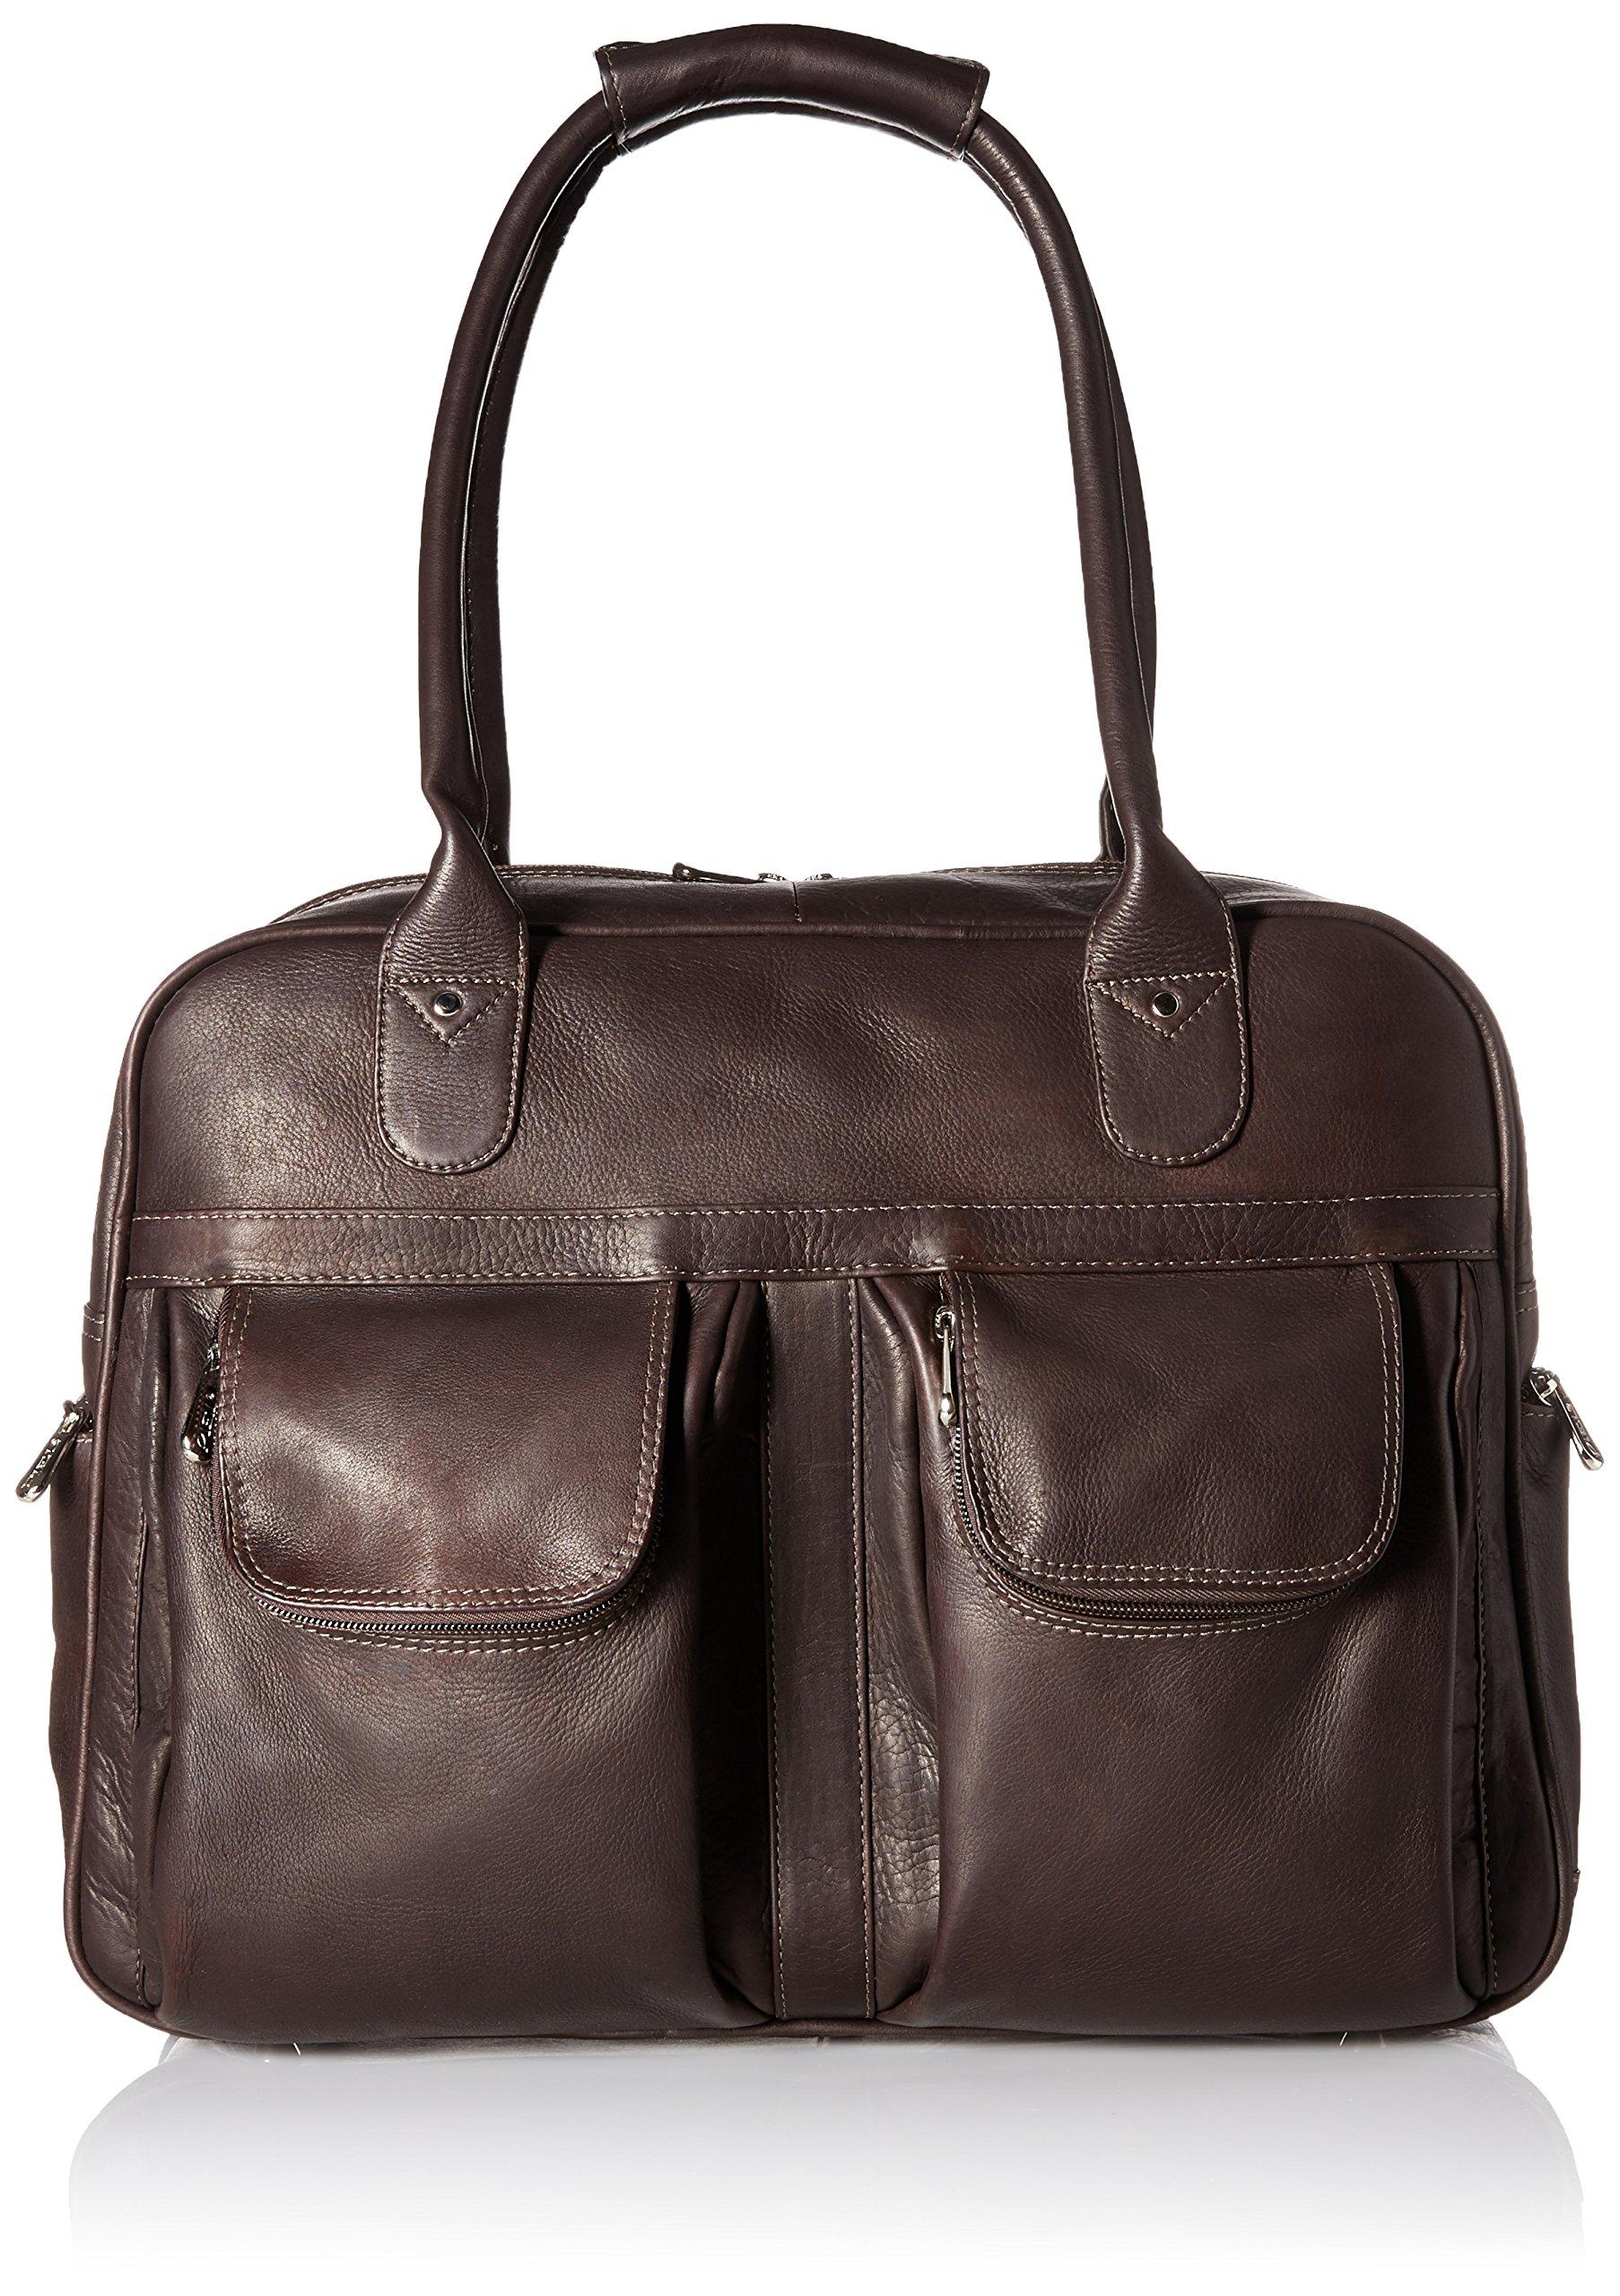 Piel Leather Multi-Pocket Satchel, Chocolate, One Size